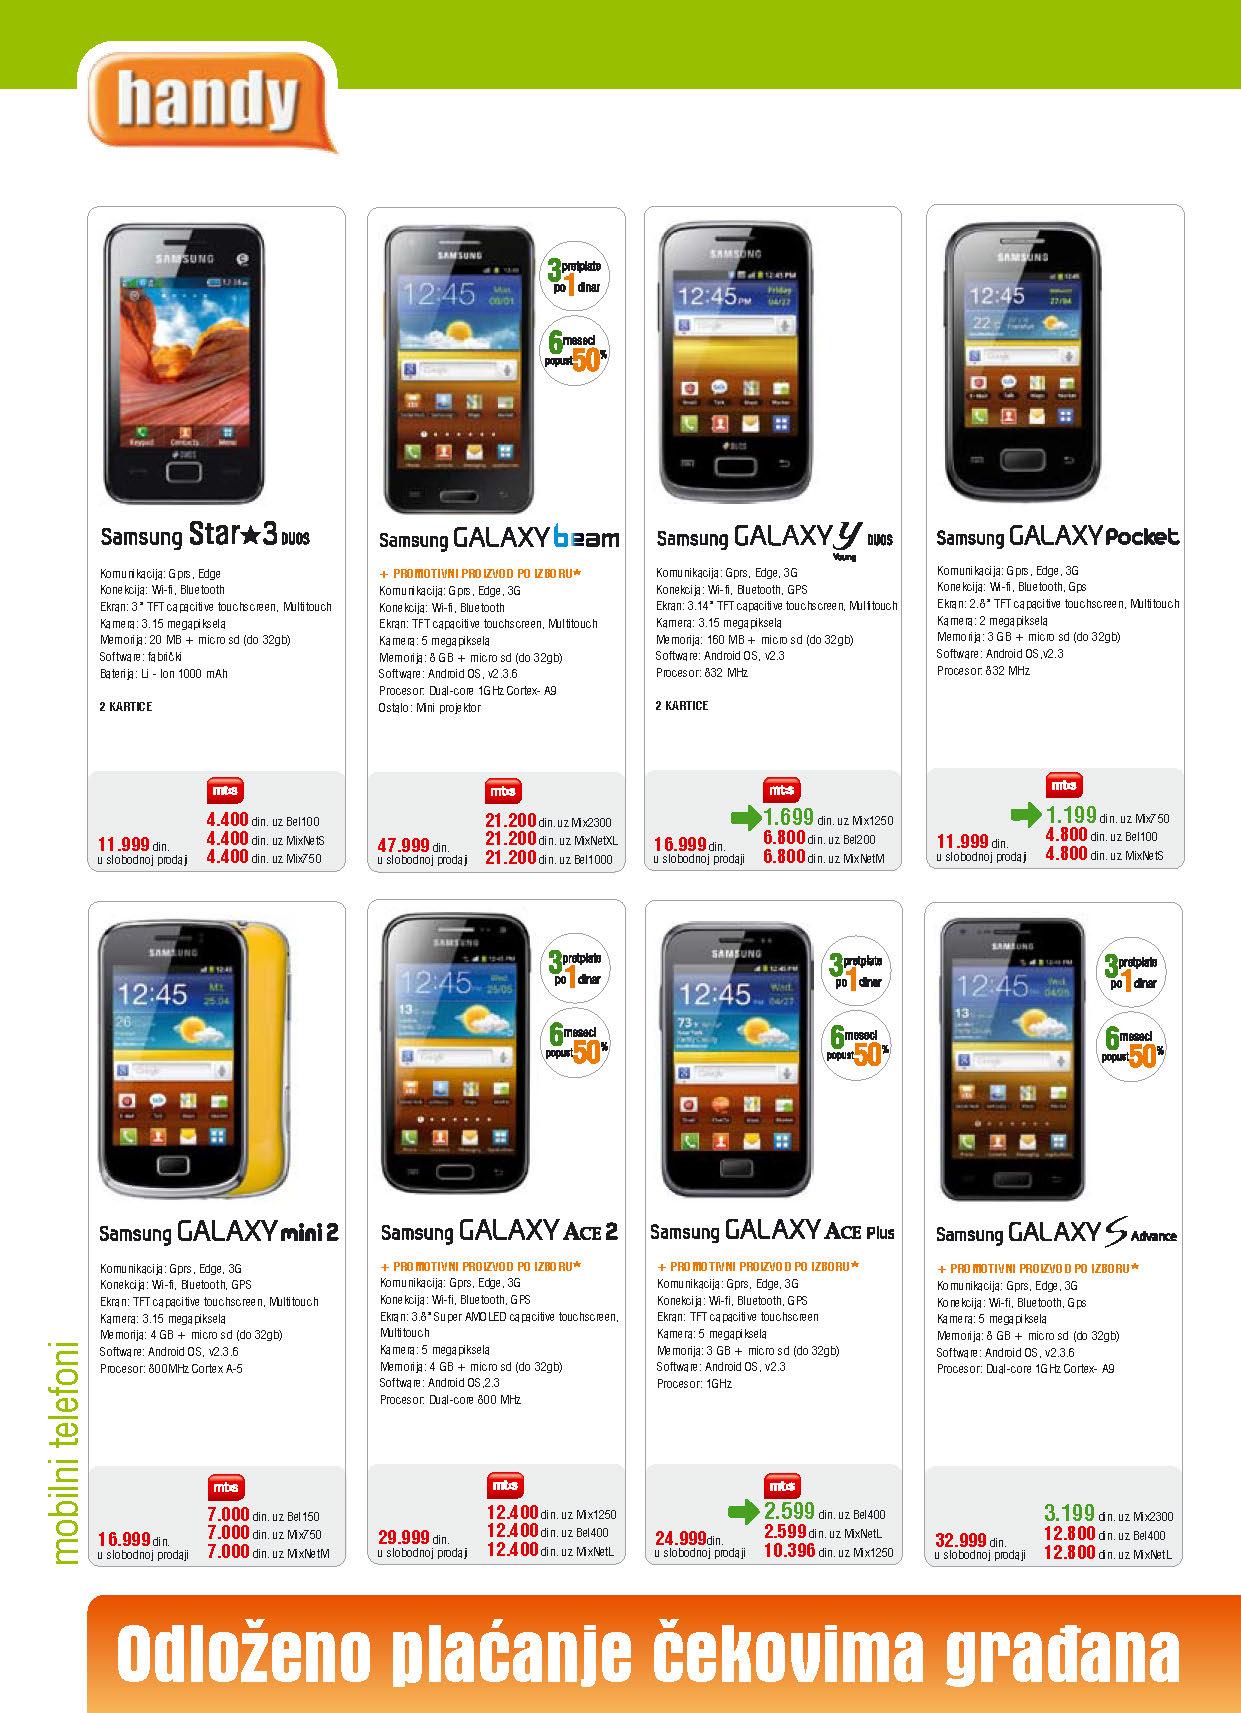 Handy Katalog Mobilni telefoni